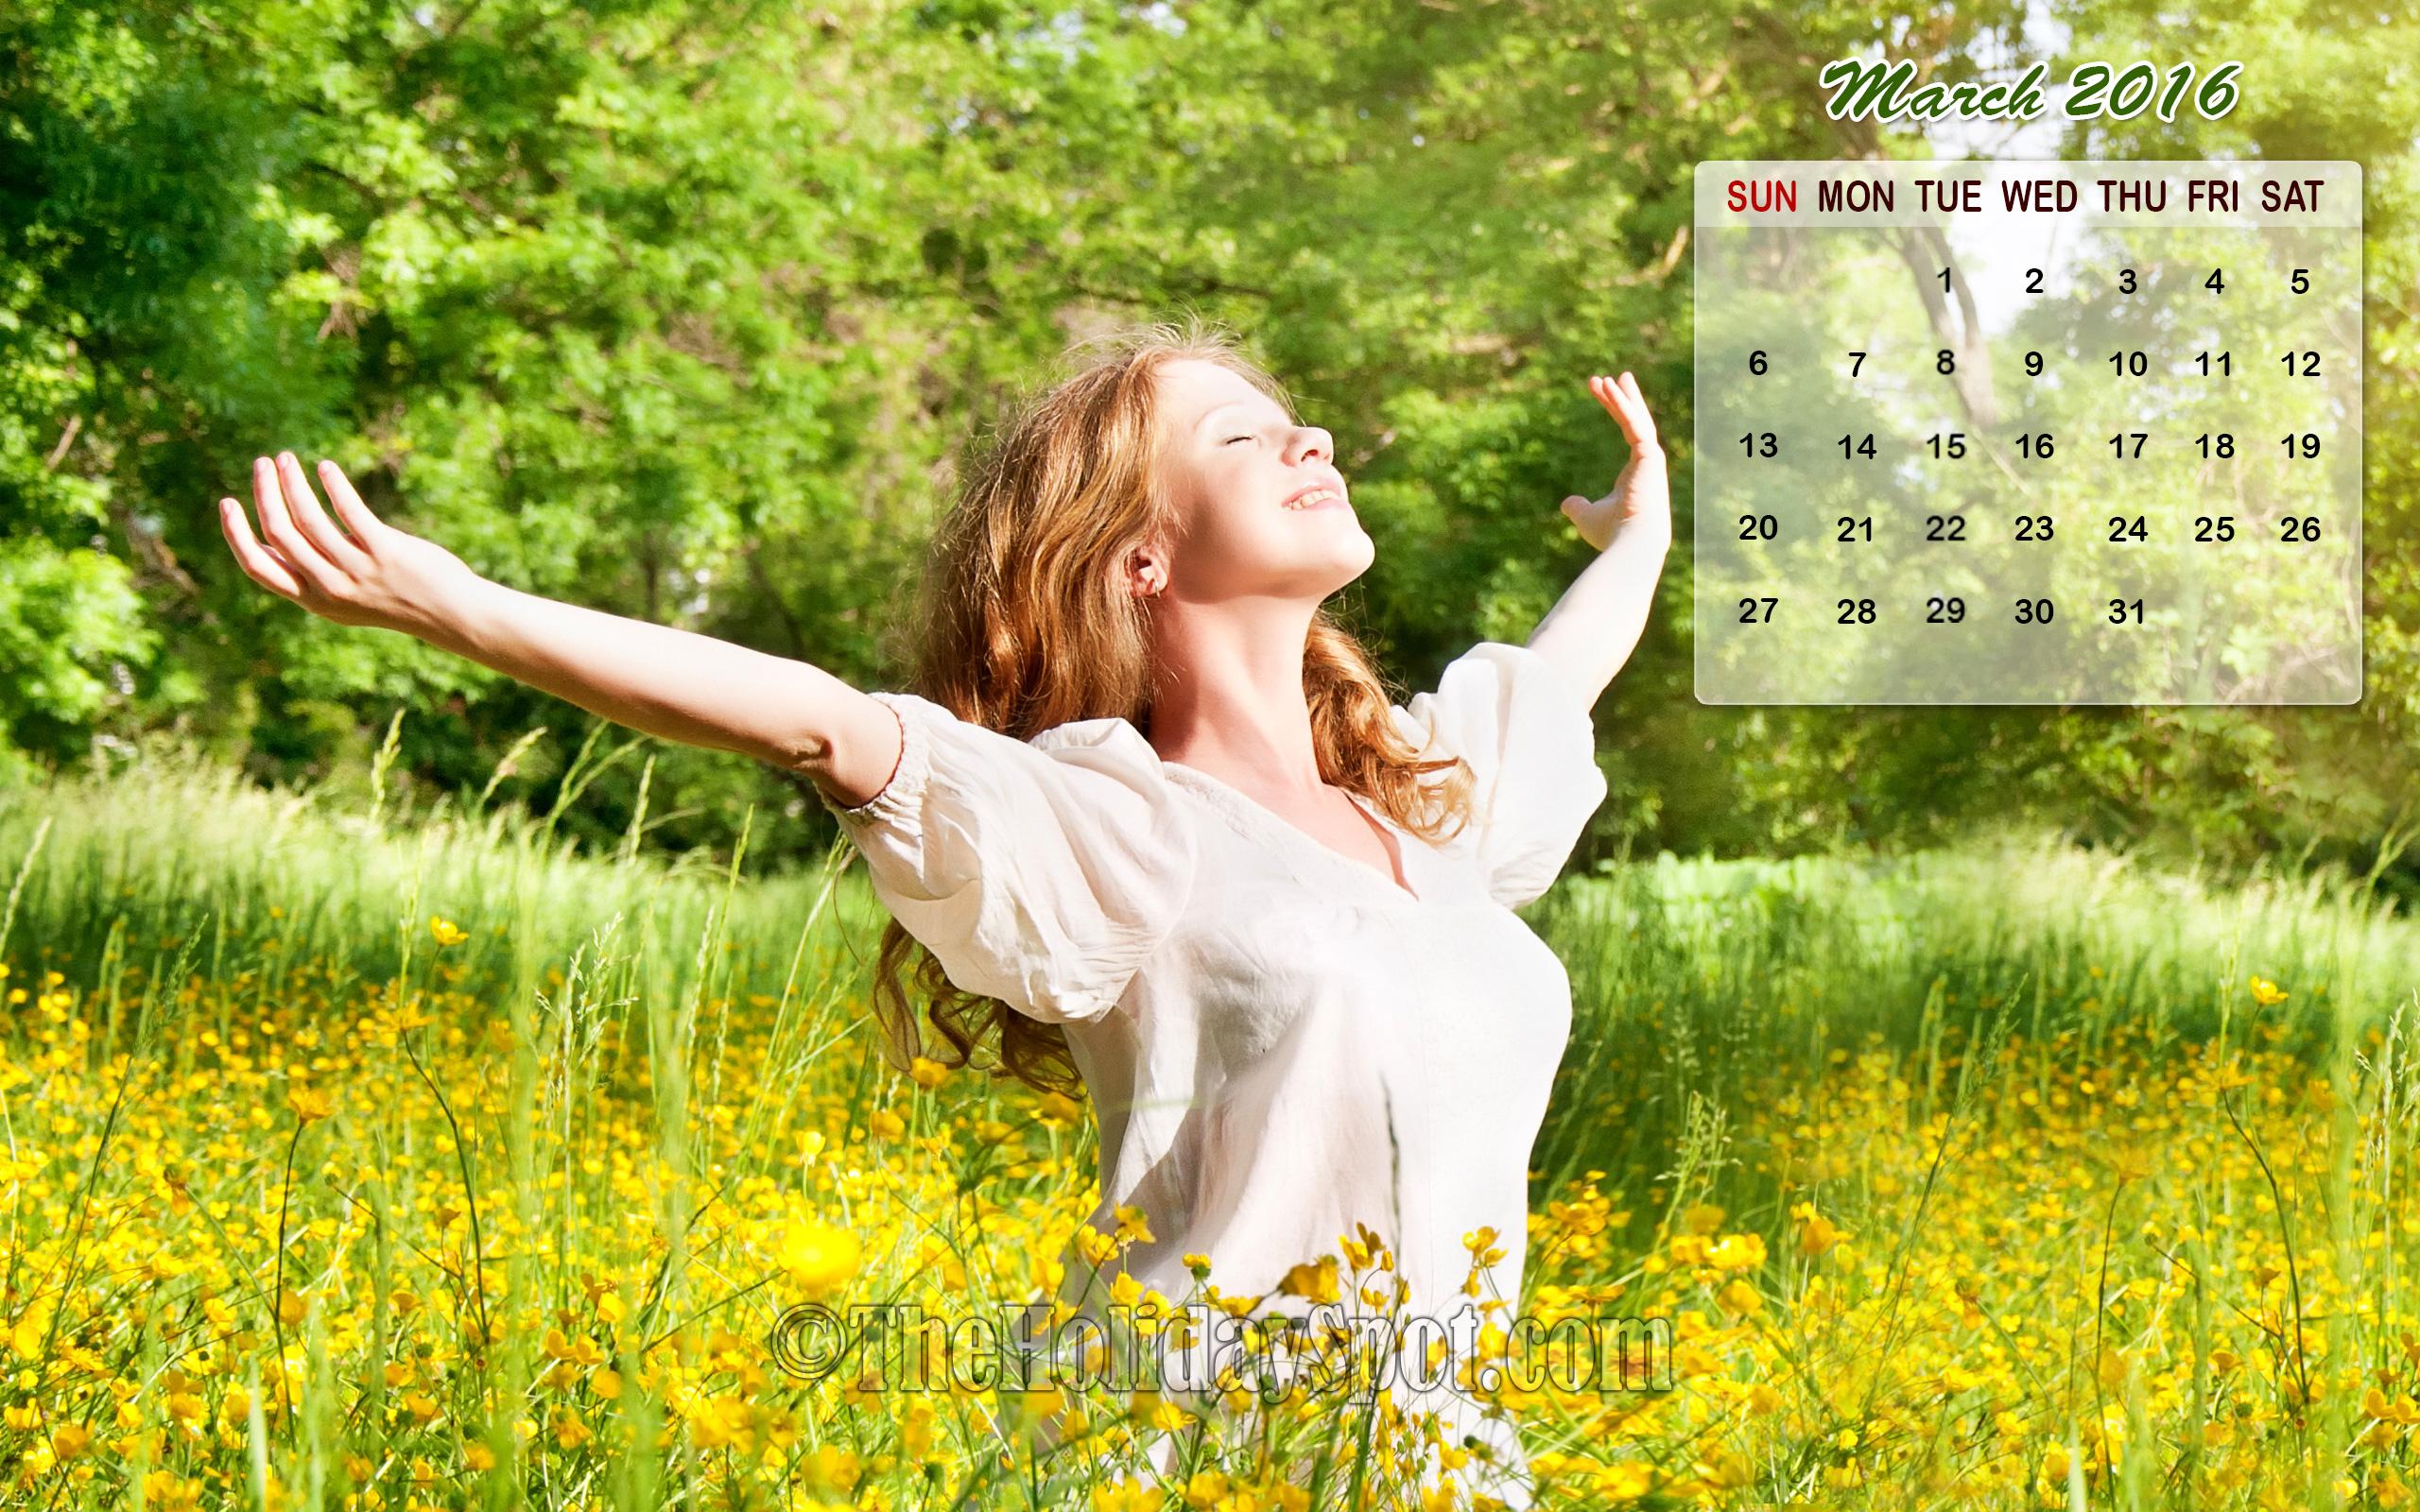 February Calendar Wallpaper 2016   Wallpapers from TheHolidaySpot 2560x1600